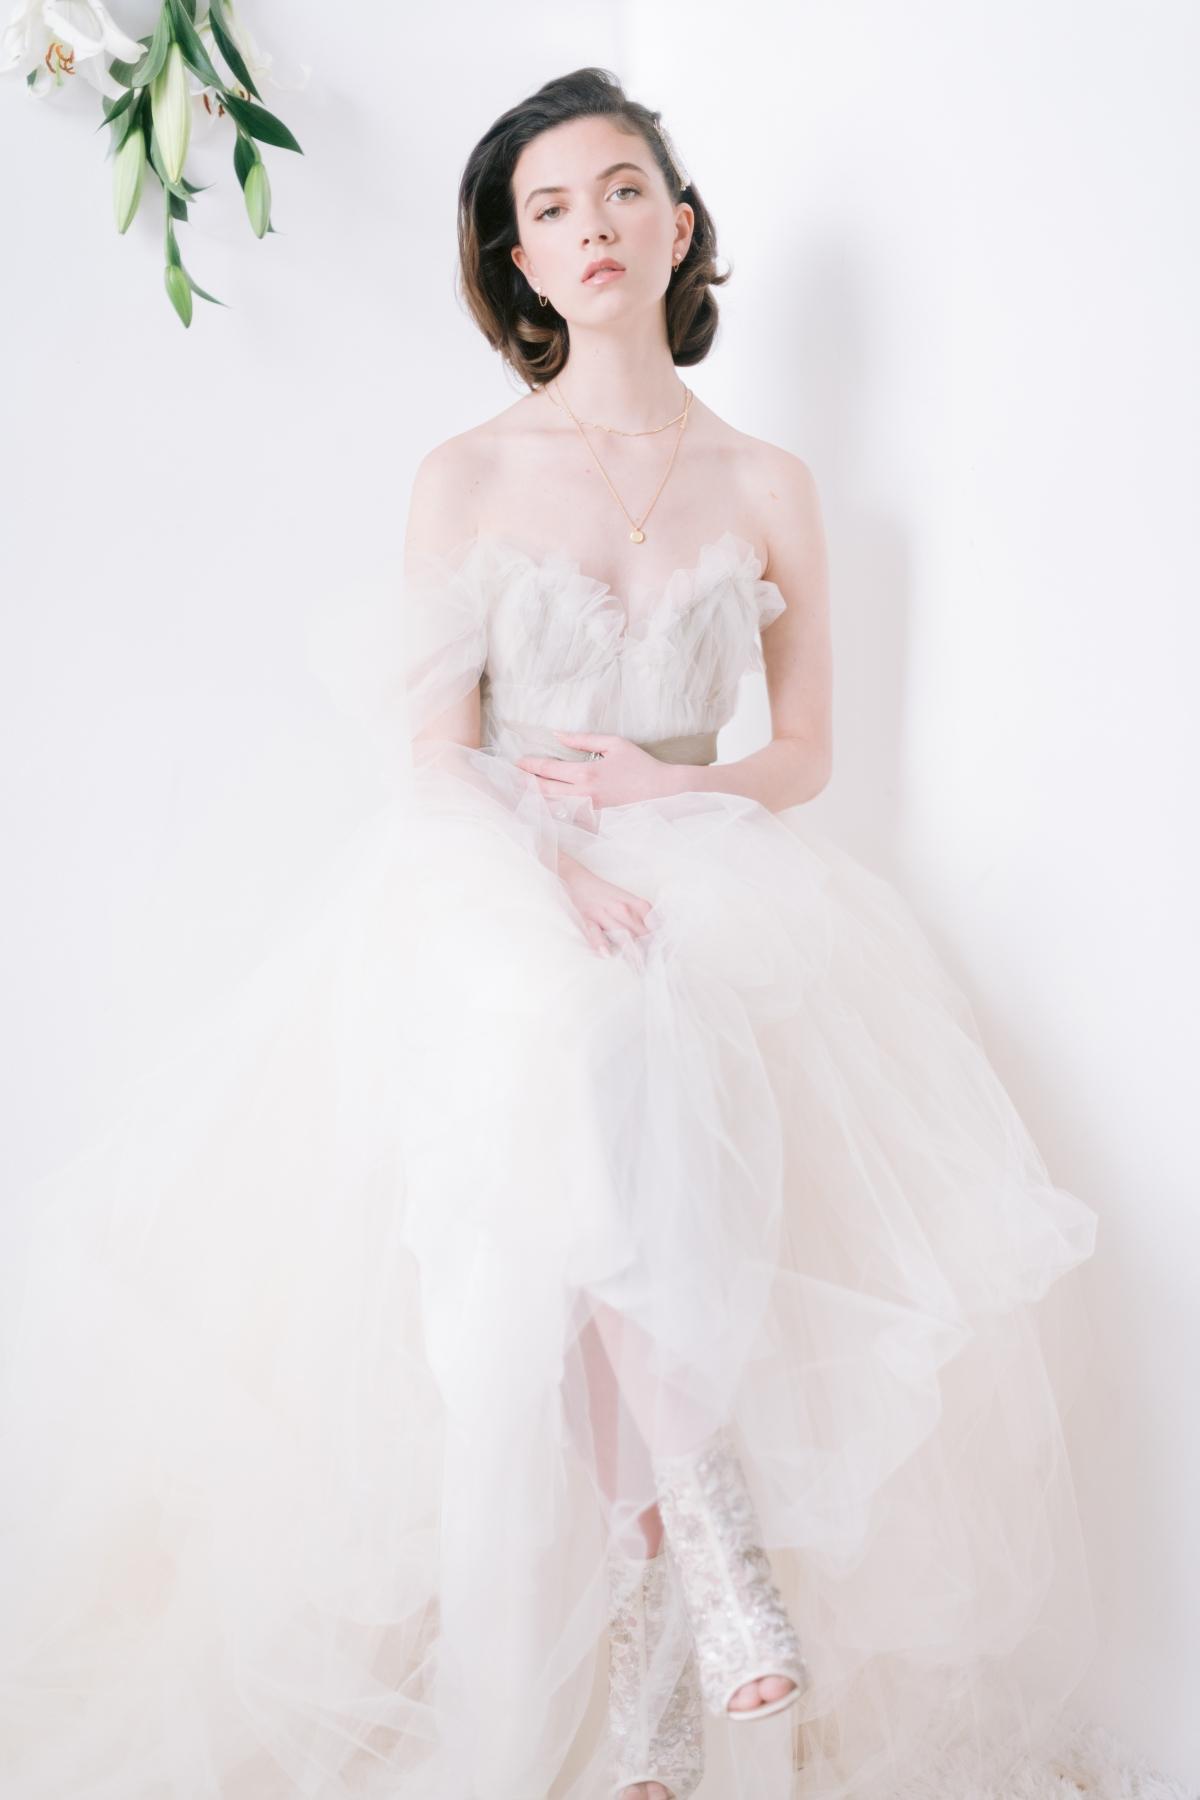 Laura Lanzerotte Bridal Danielle Heinson Photography 50